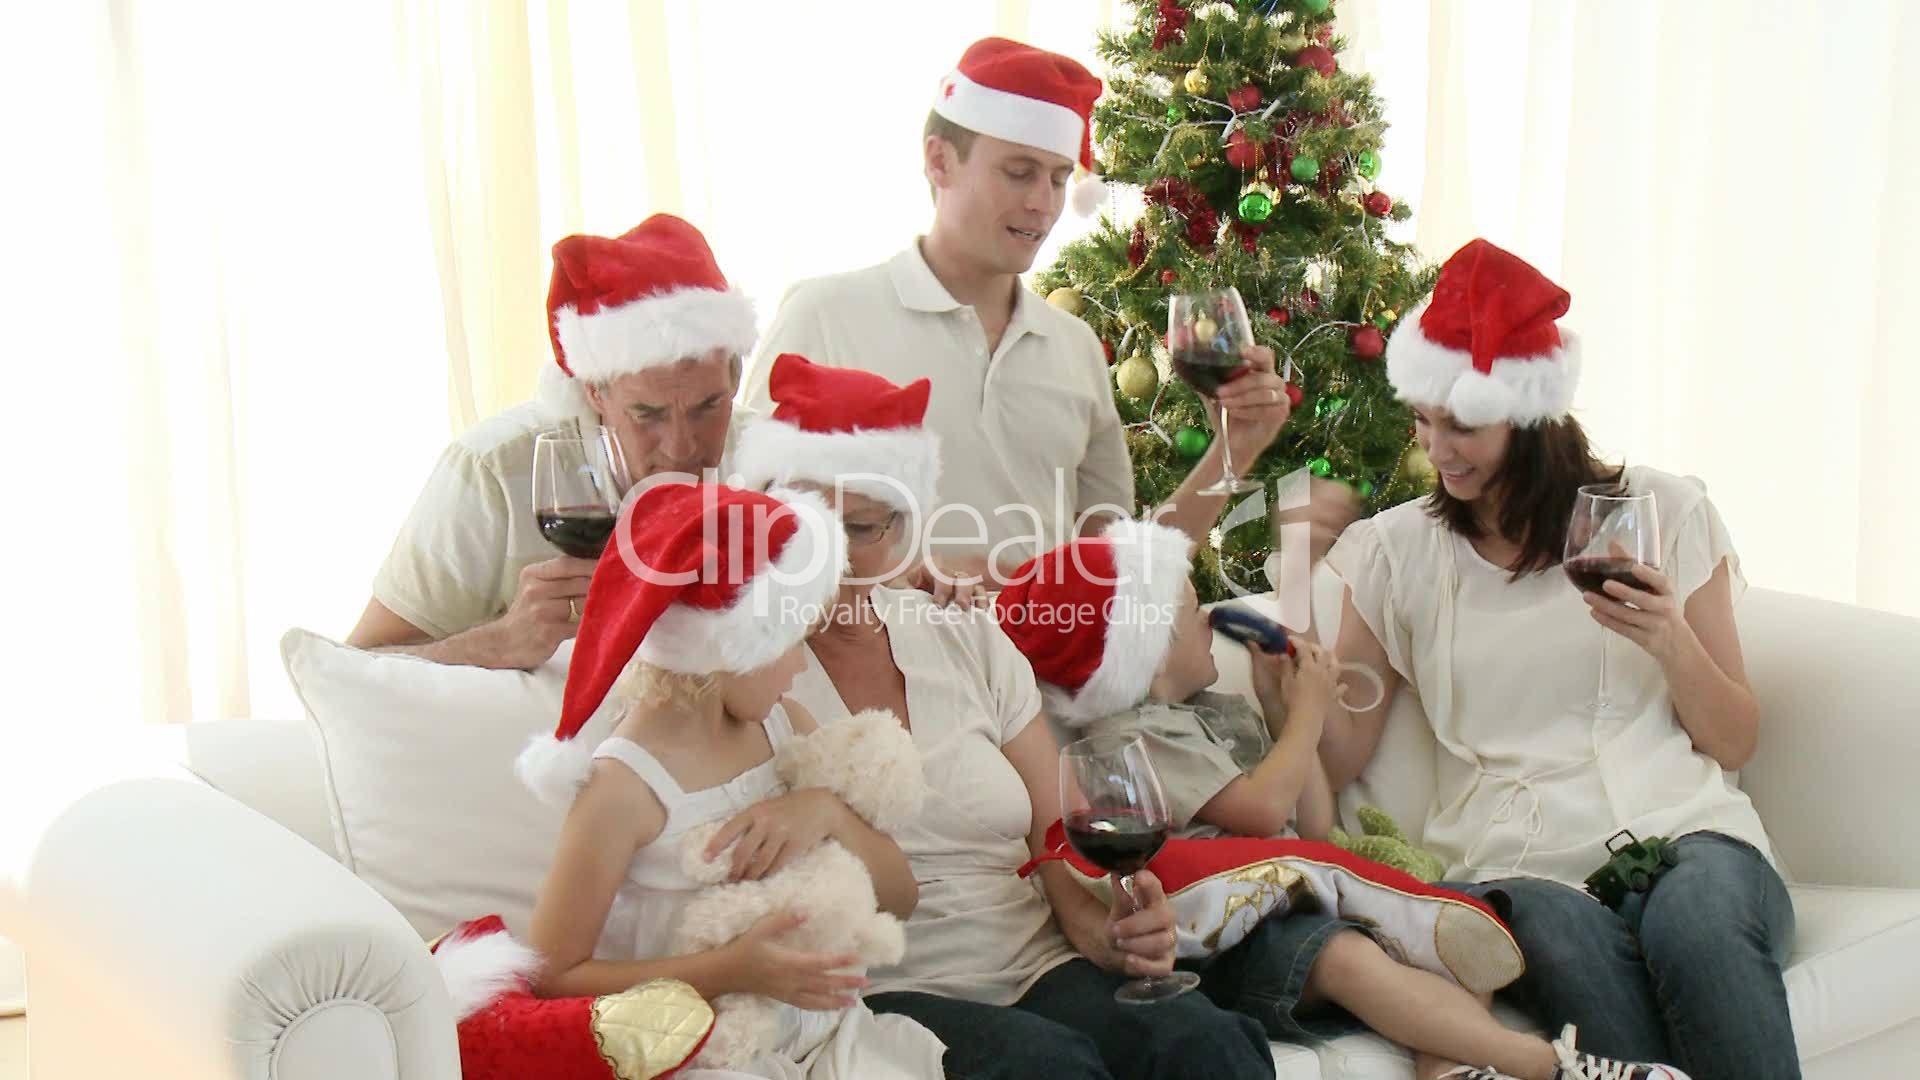 gro familie feiert weihnachten v deos de archivo y clips. Black Bedroom Furniture Sets. Home Design Ideas